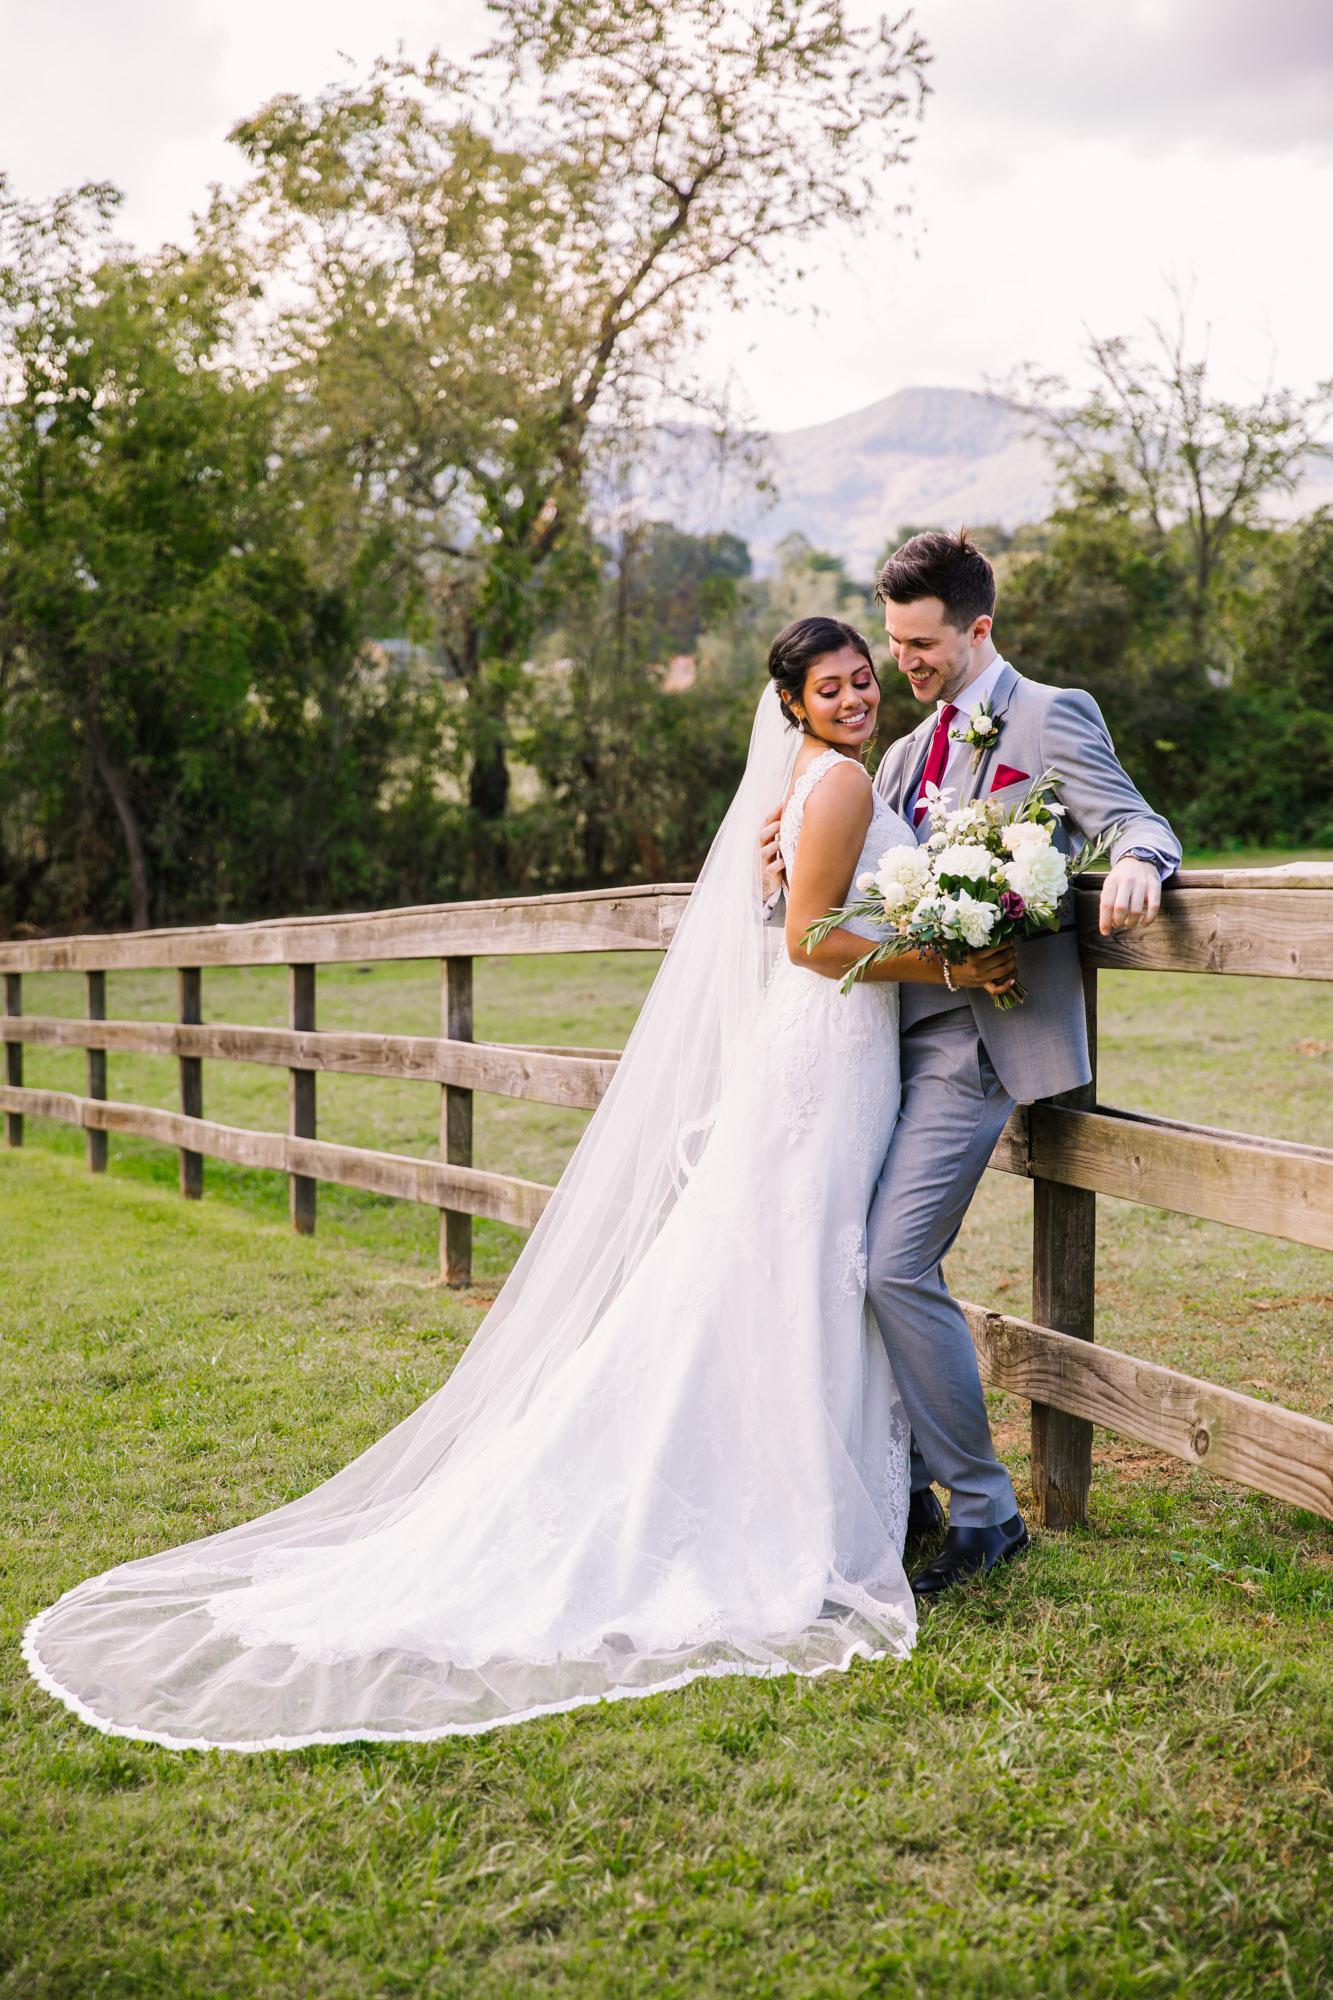 Waynesville NC Wedding Photography | Bride and Groom Portrait Full Body